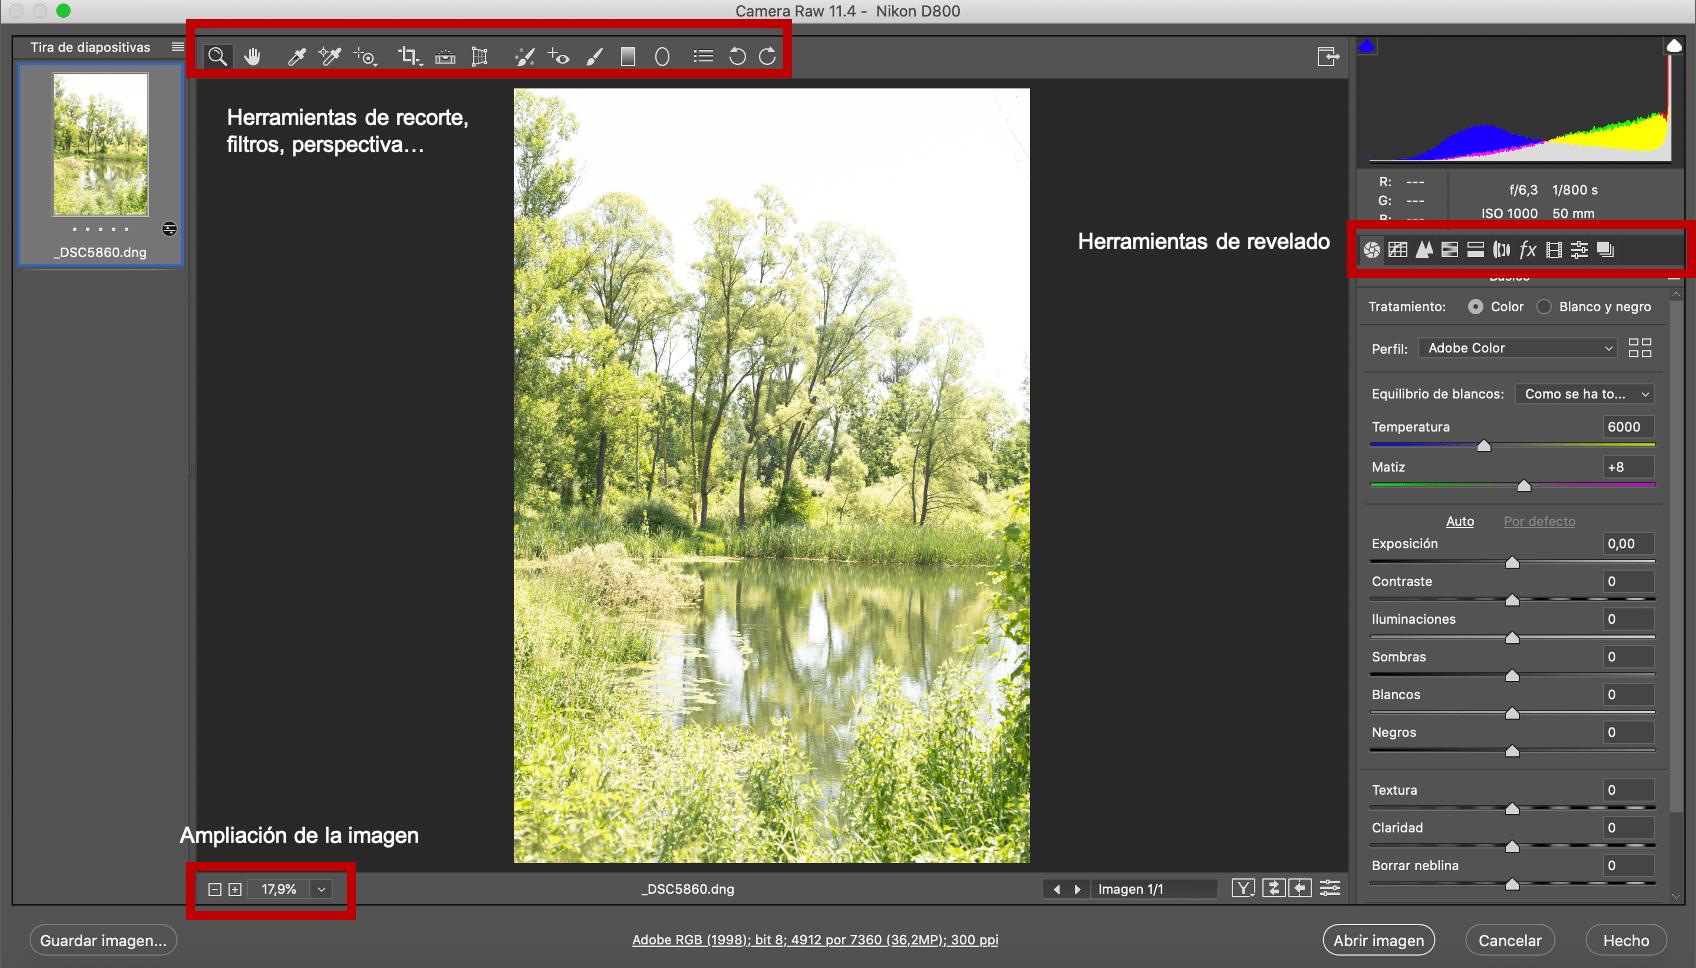 CameraRAW interface